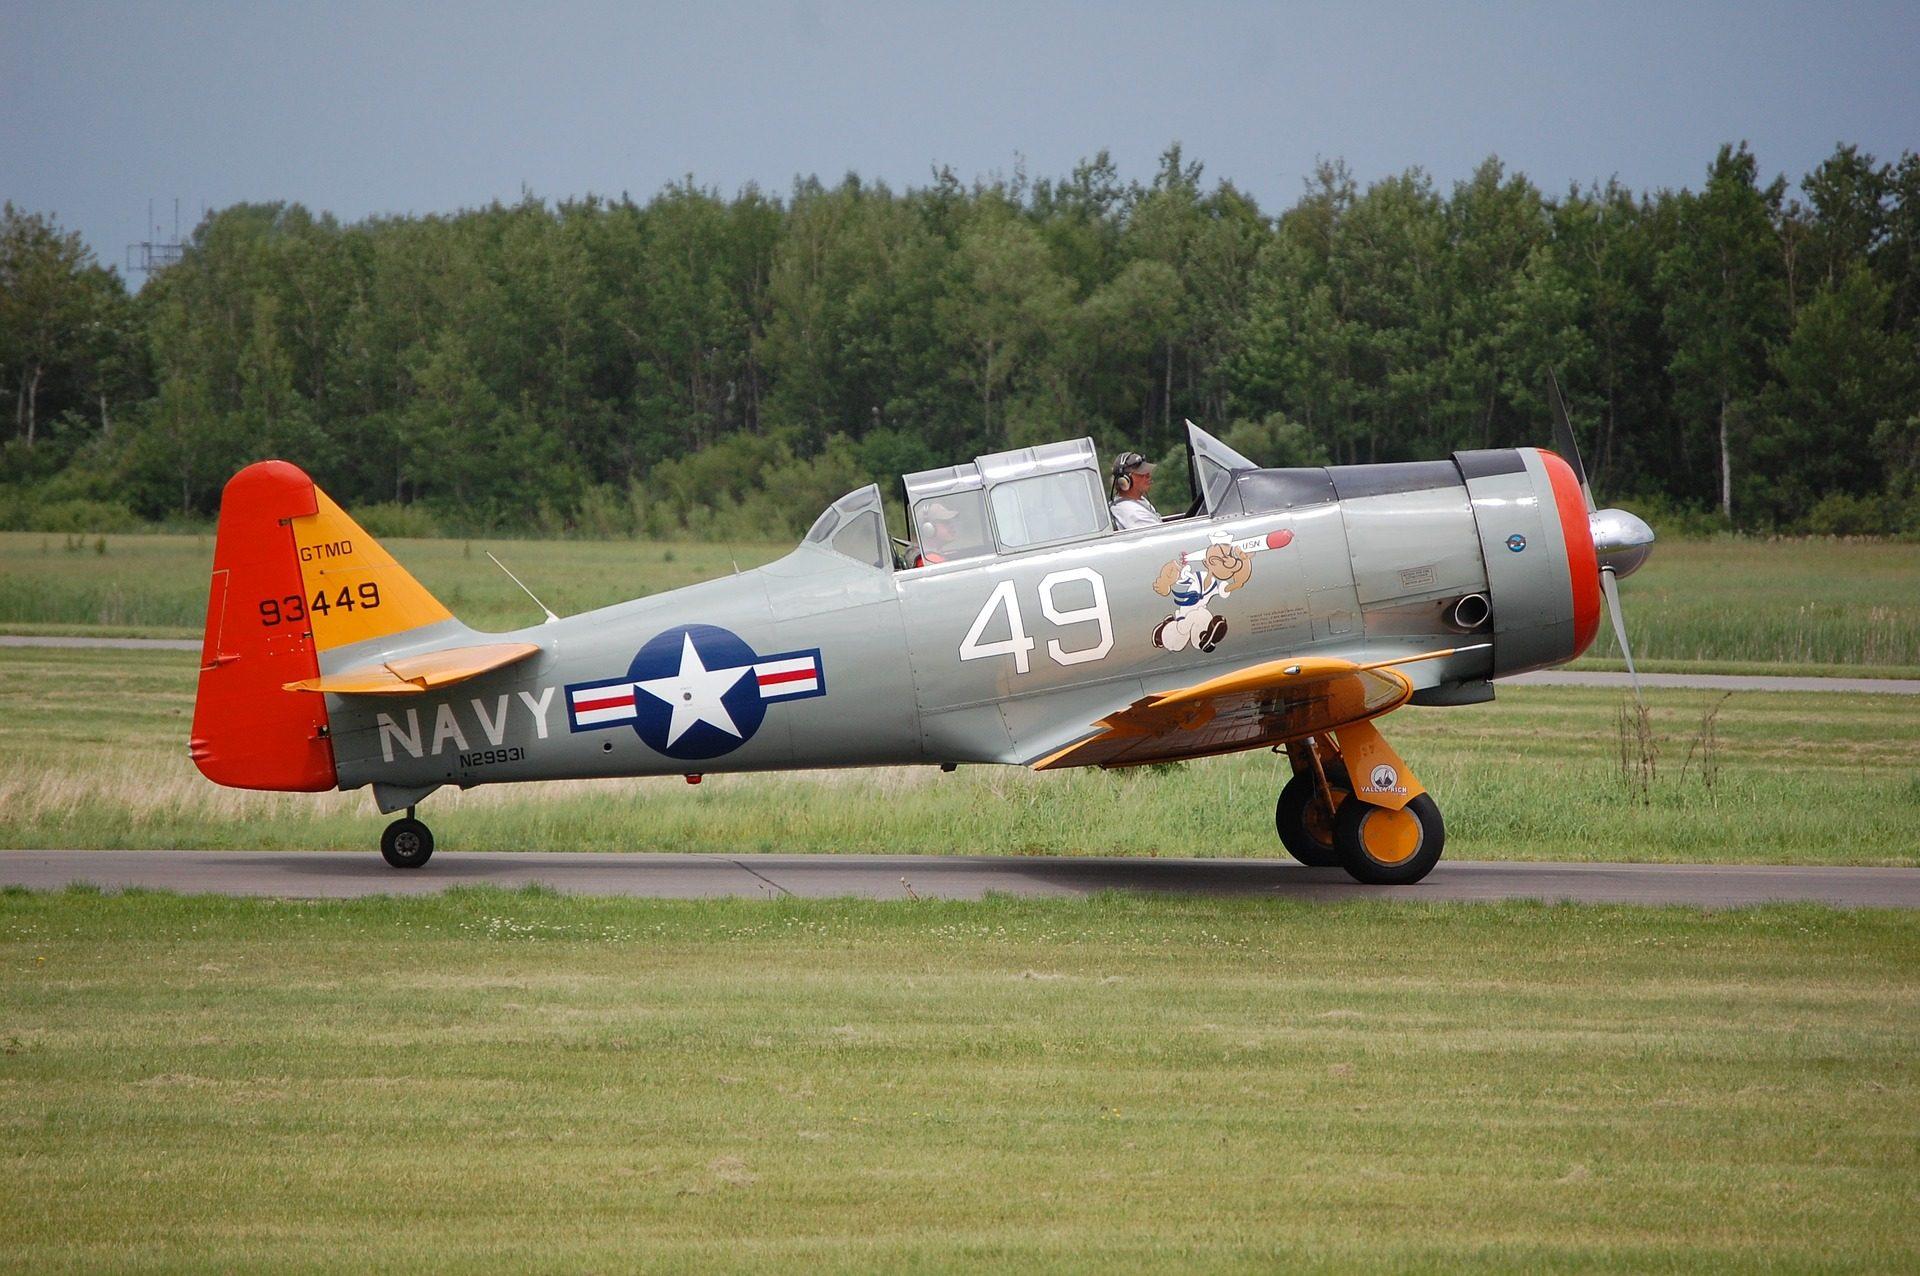 aerei leggeri, aeroplano, Marina, Esercito, vecchio, vintage - Sfondi HD - Professor-falken.com